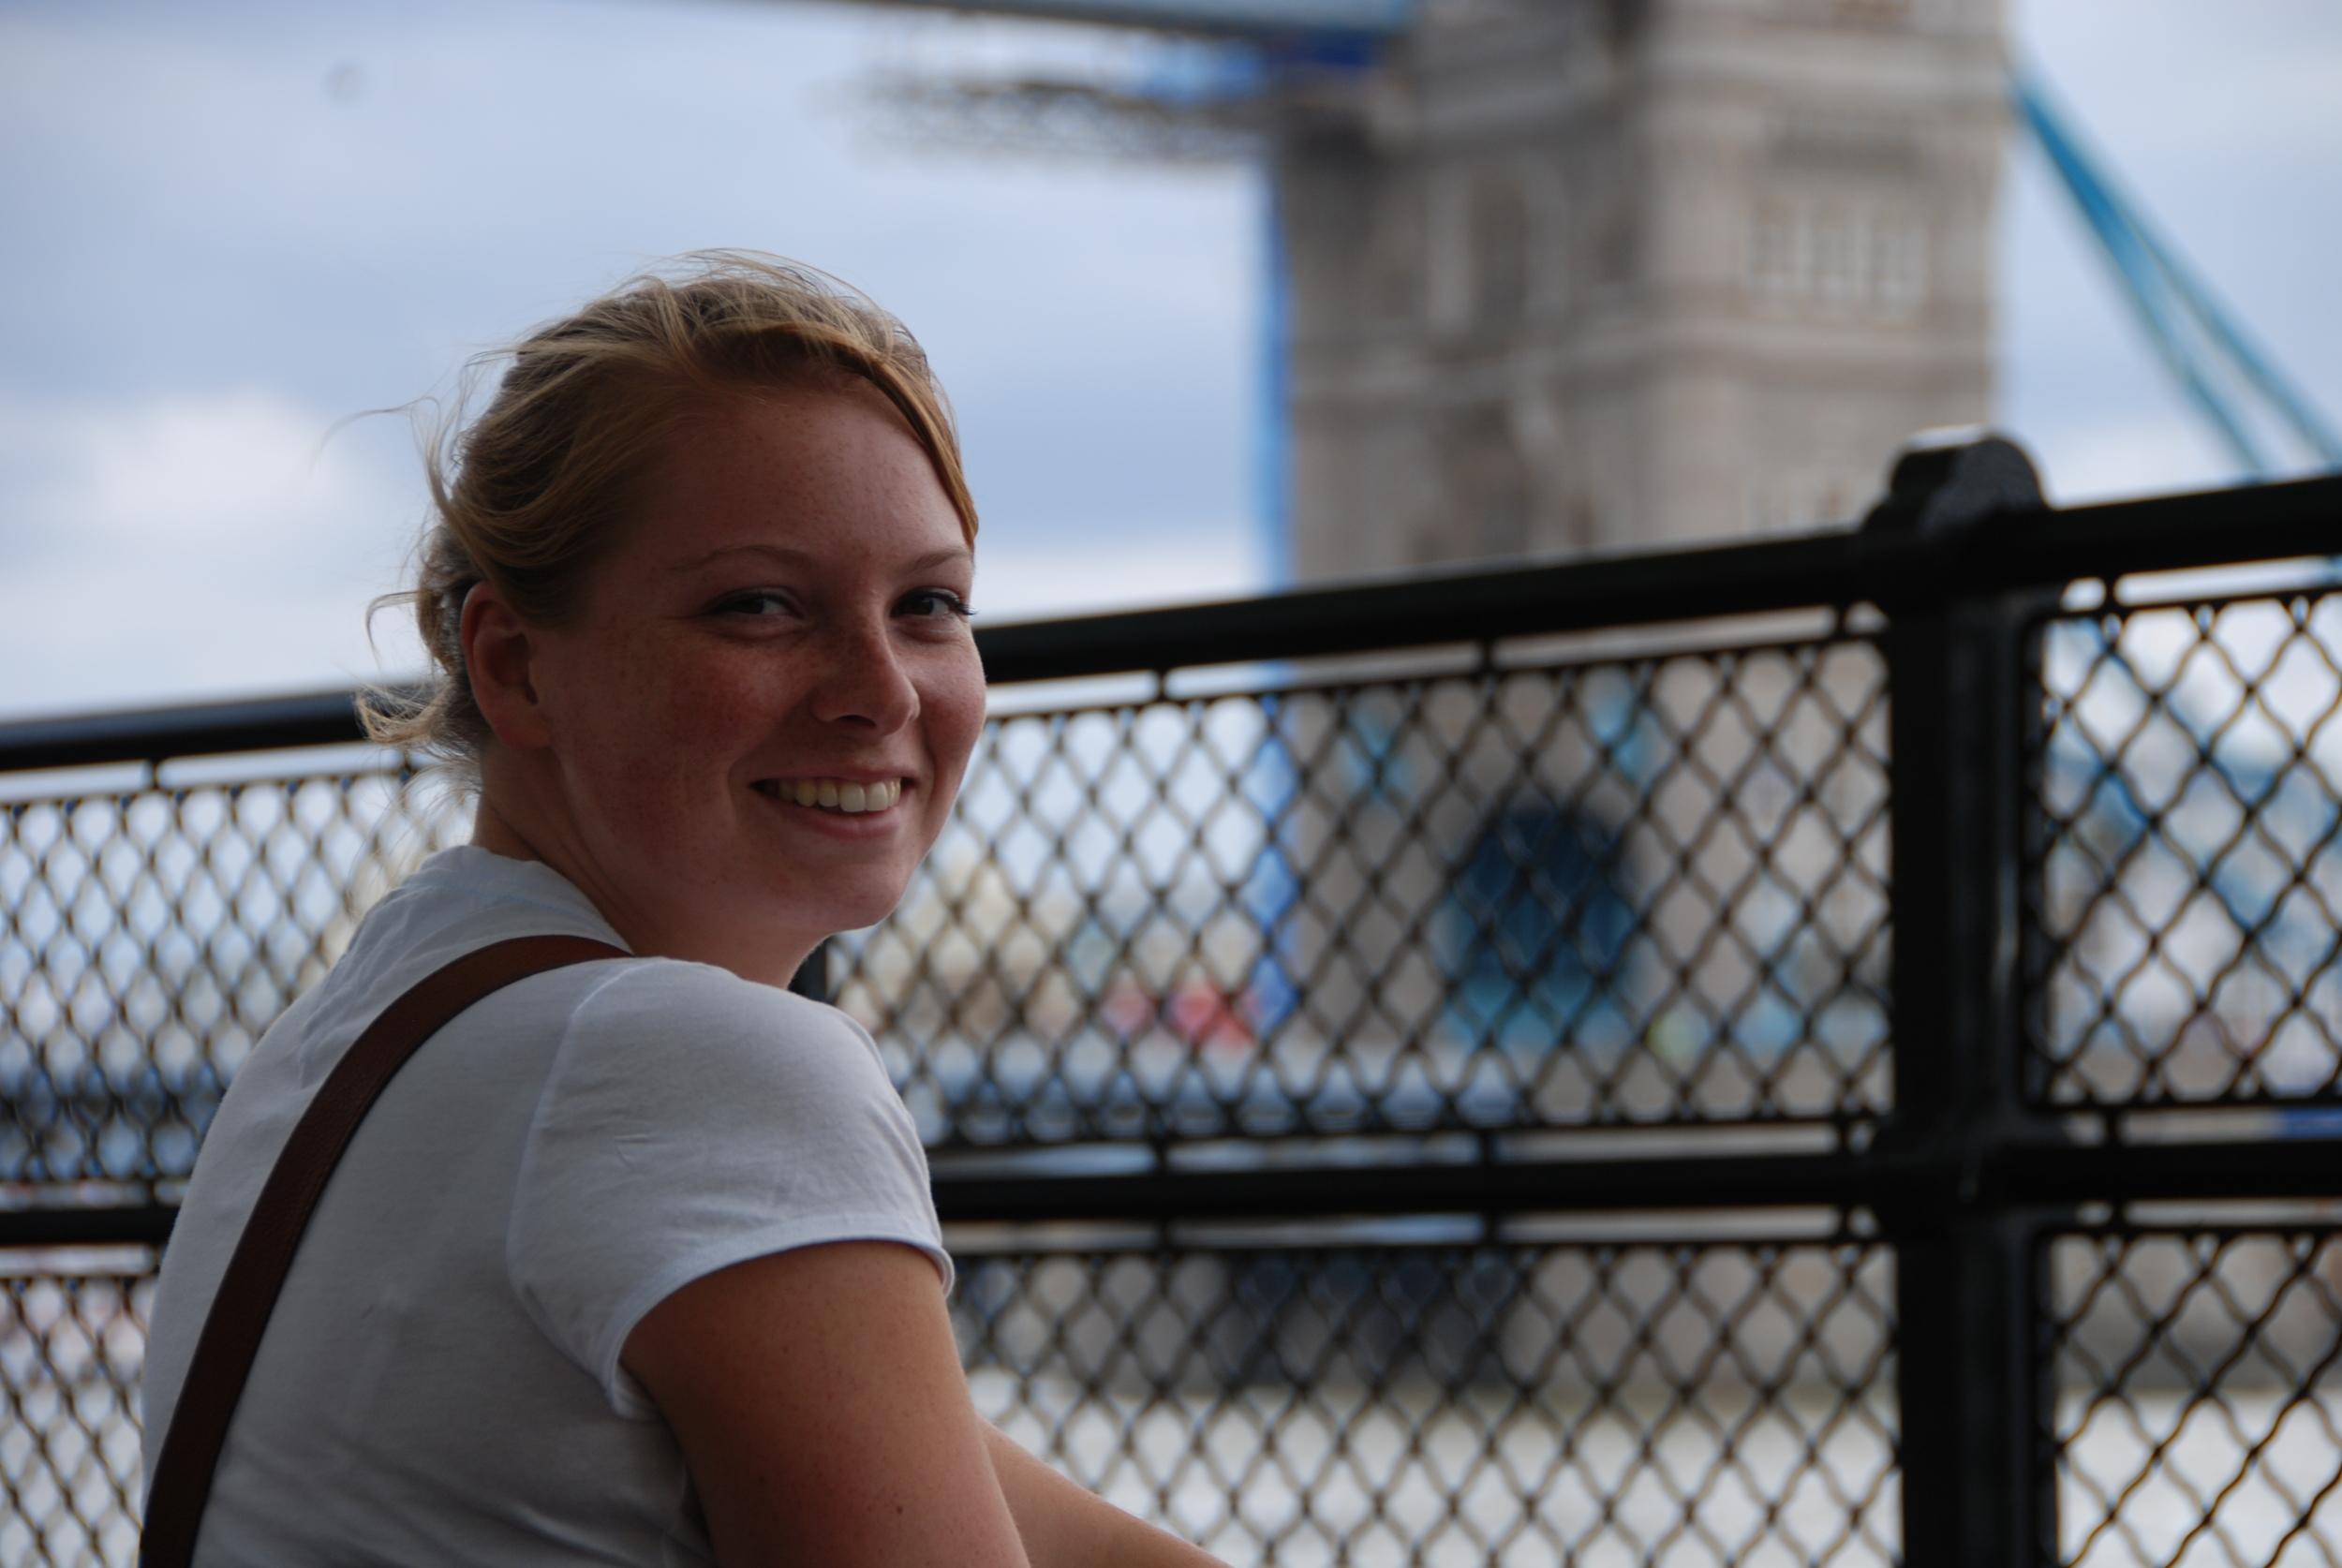 Merlin taking in the view of Tower Bridge, London